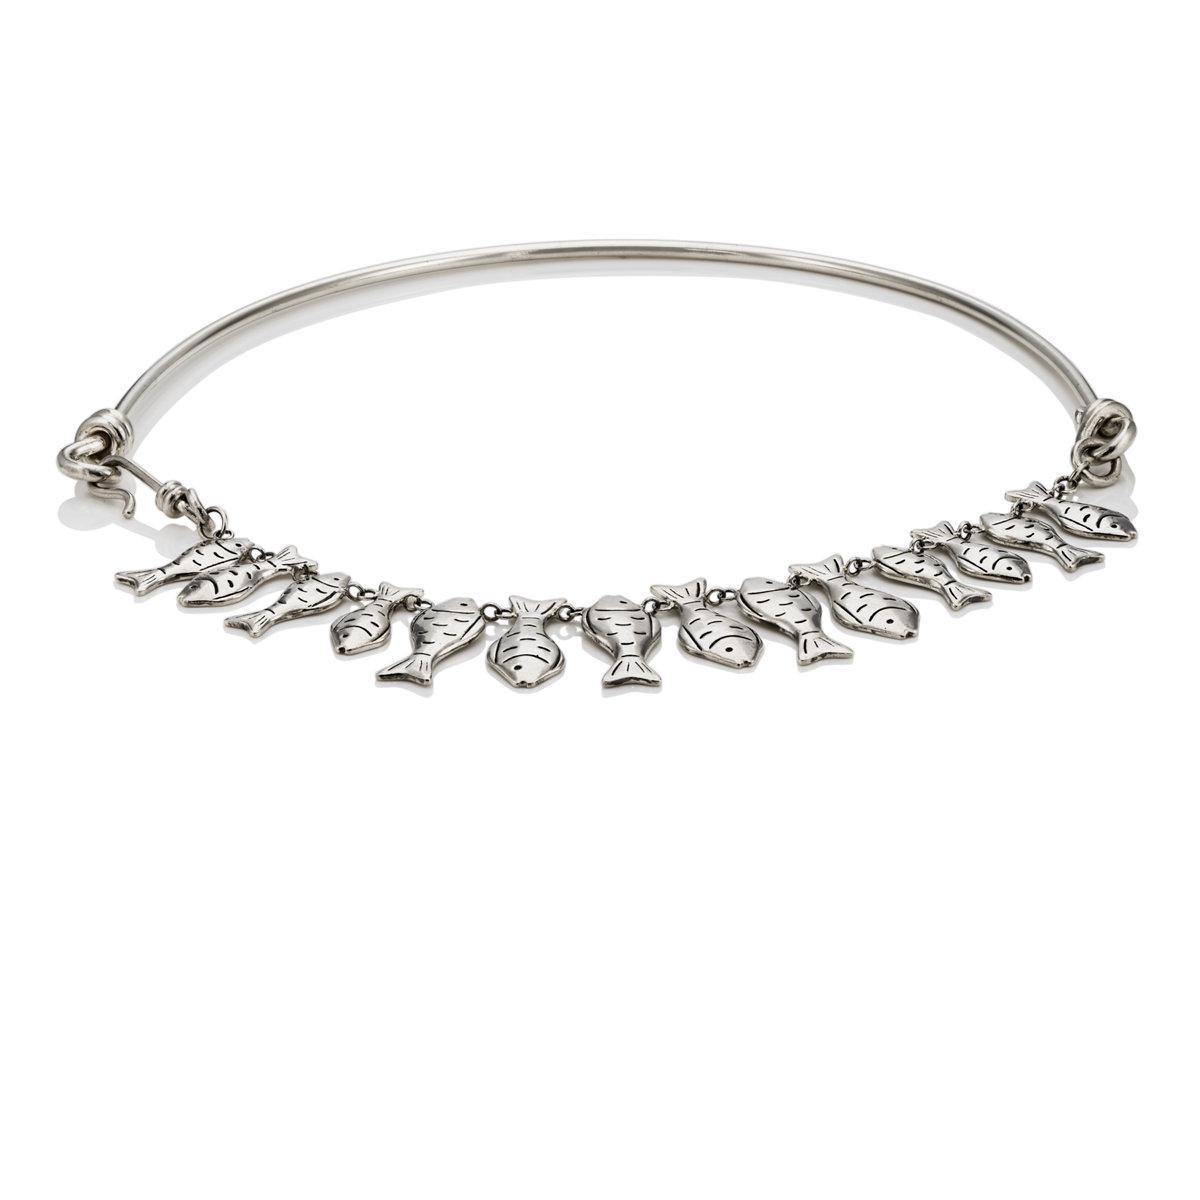 Pamela Love Womens Neptune Collar Necklace MFR57